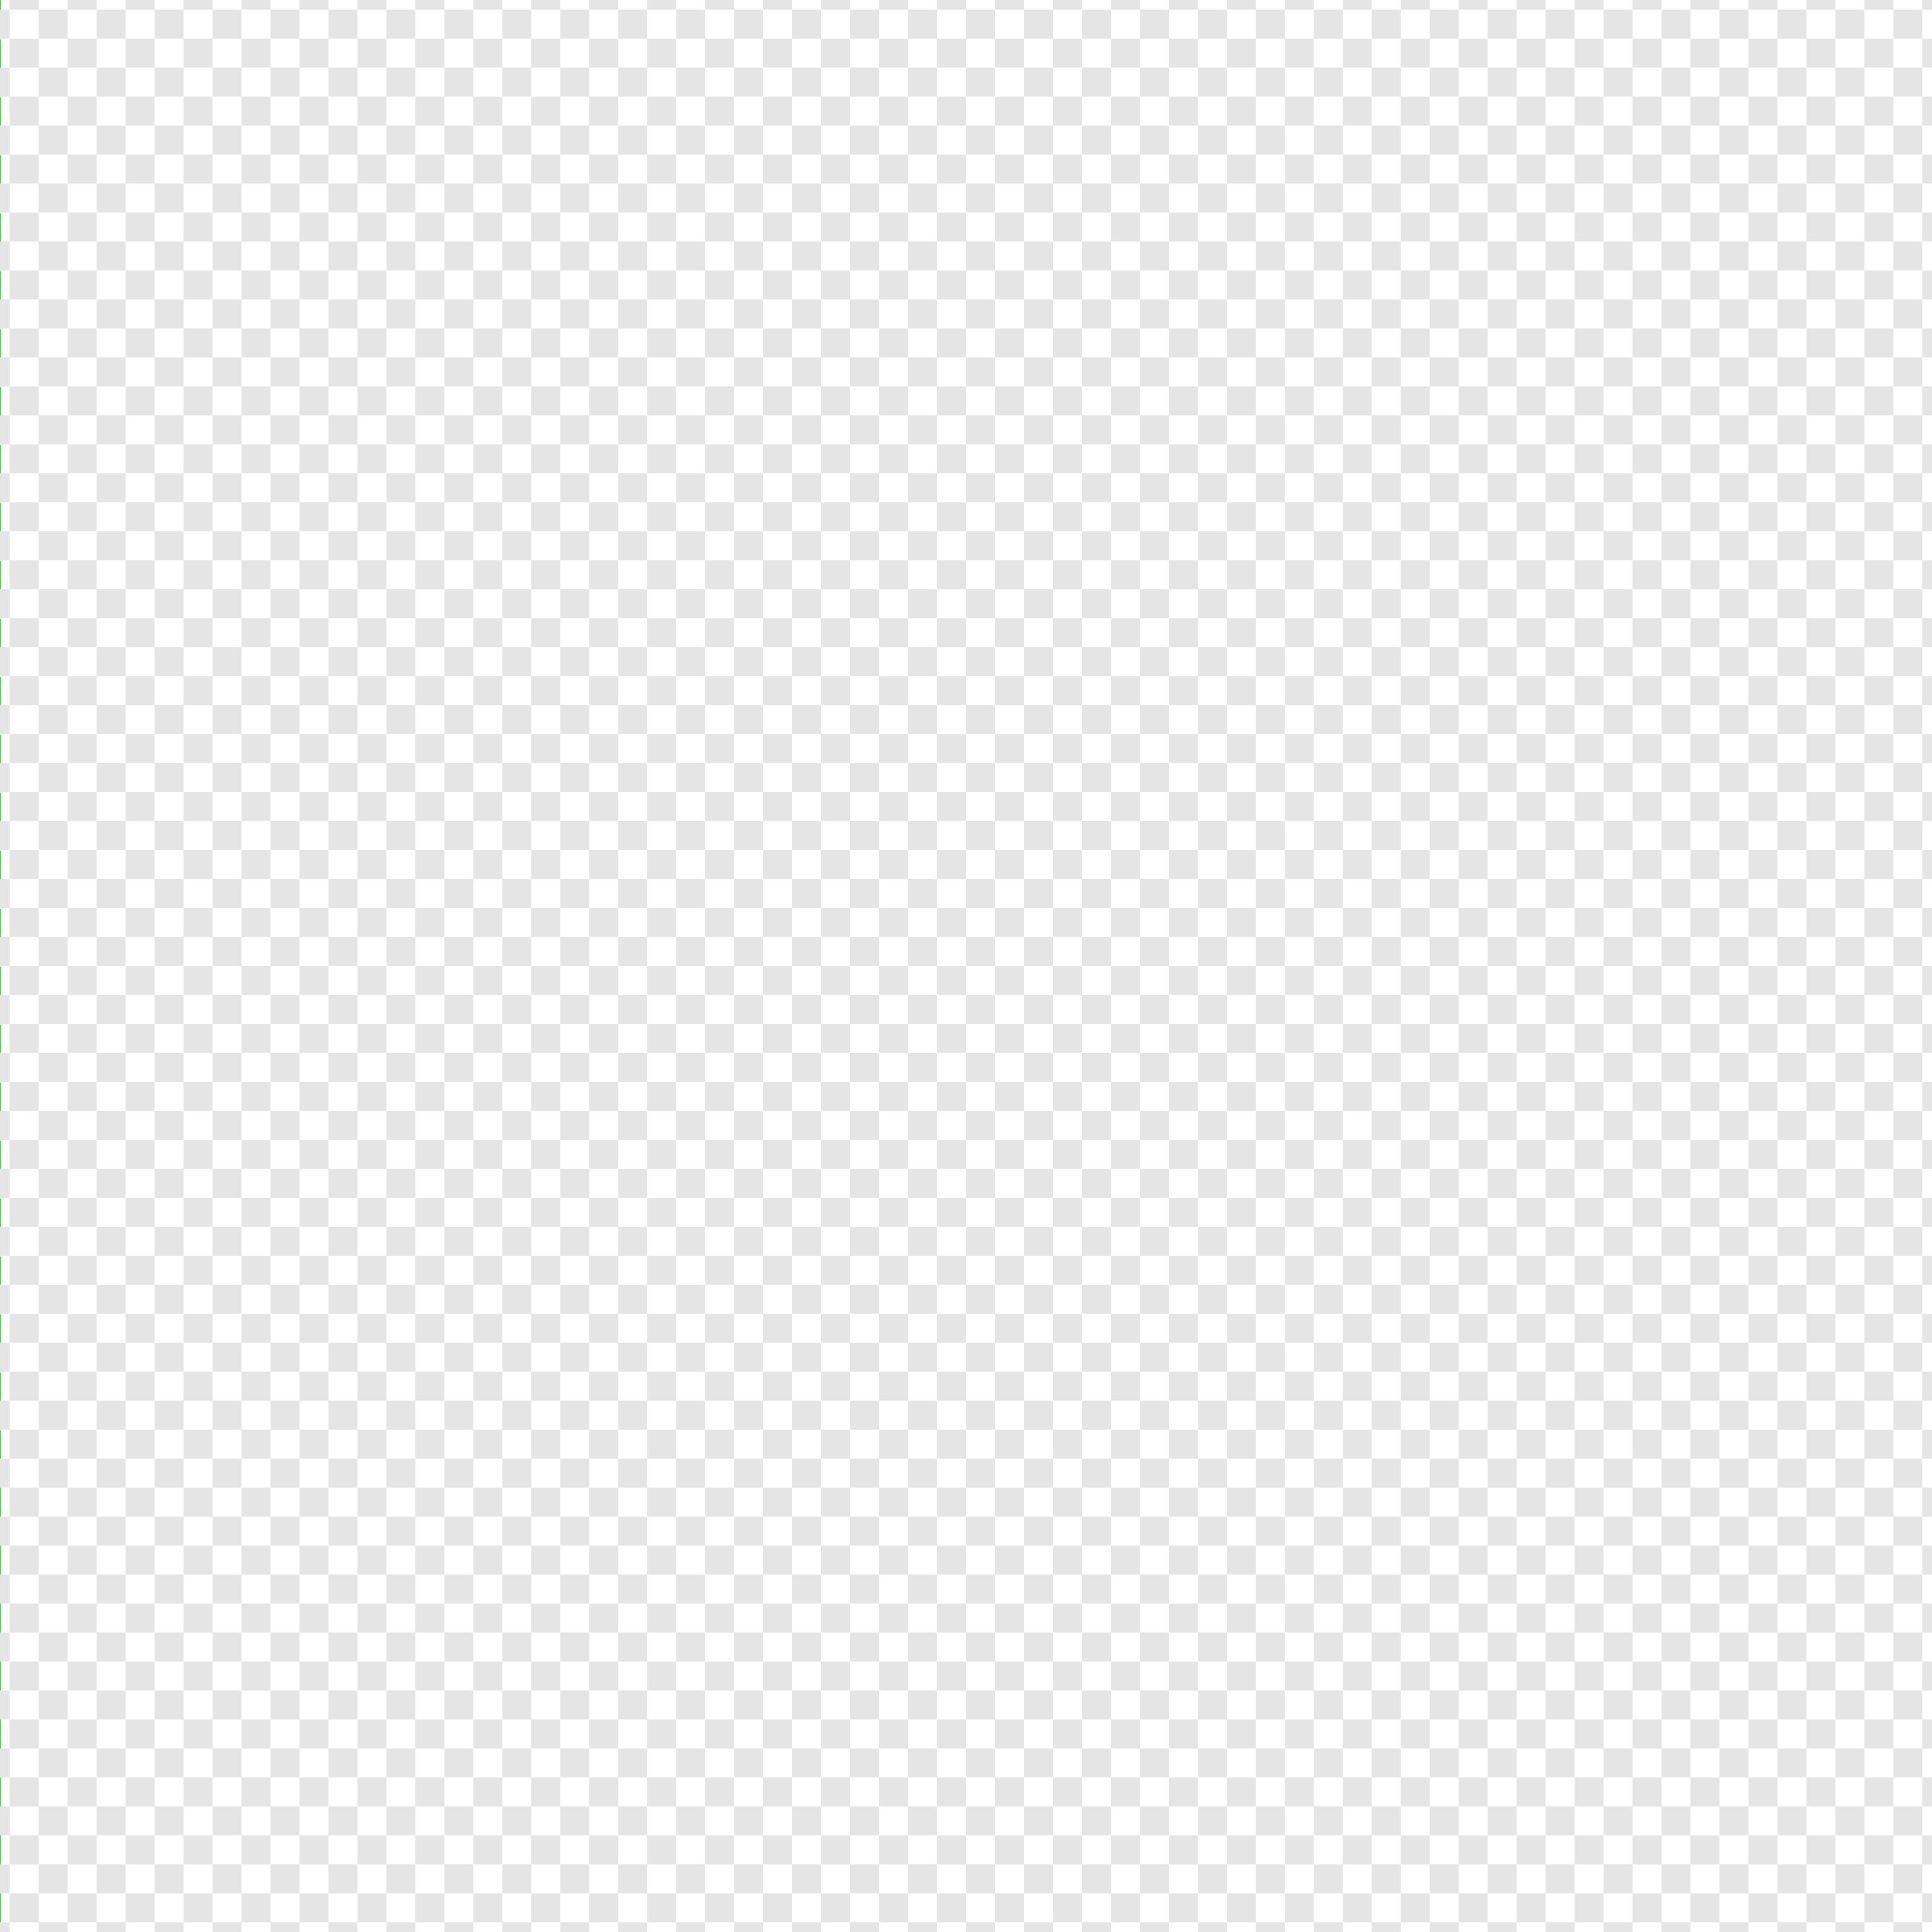 clipart transparent background pattern